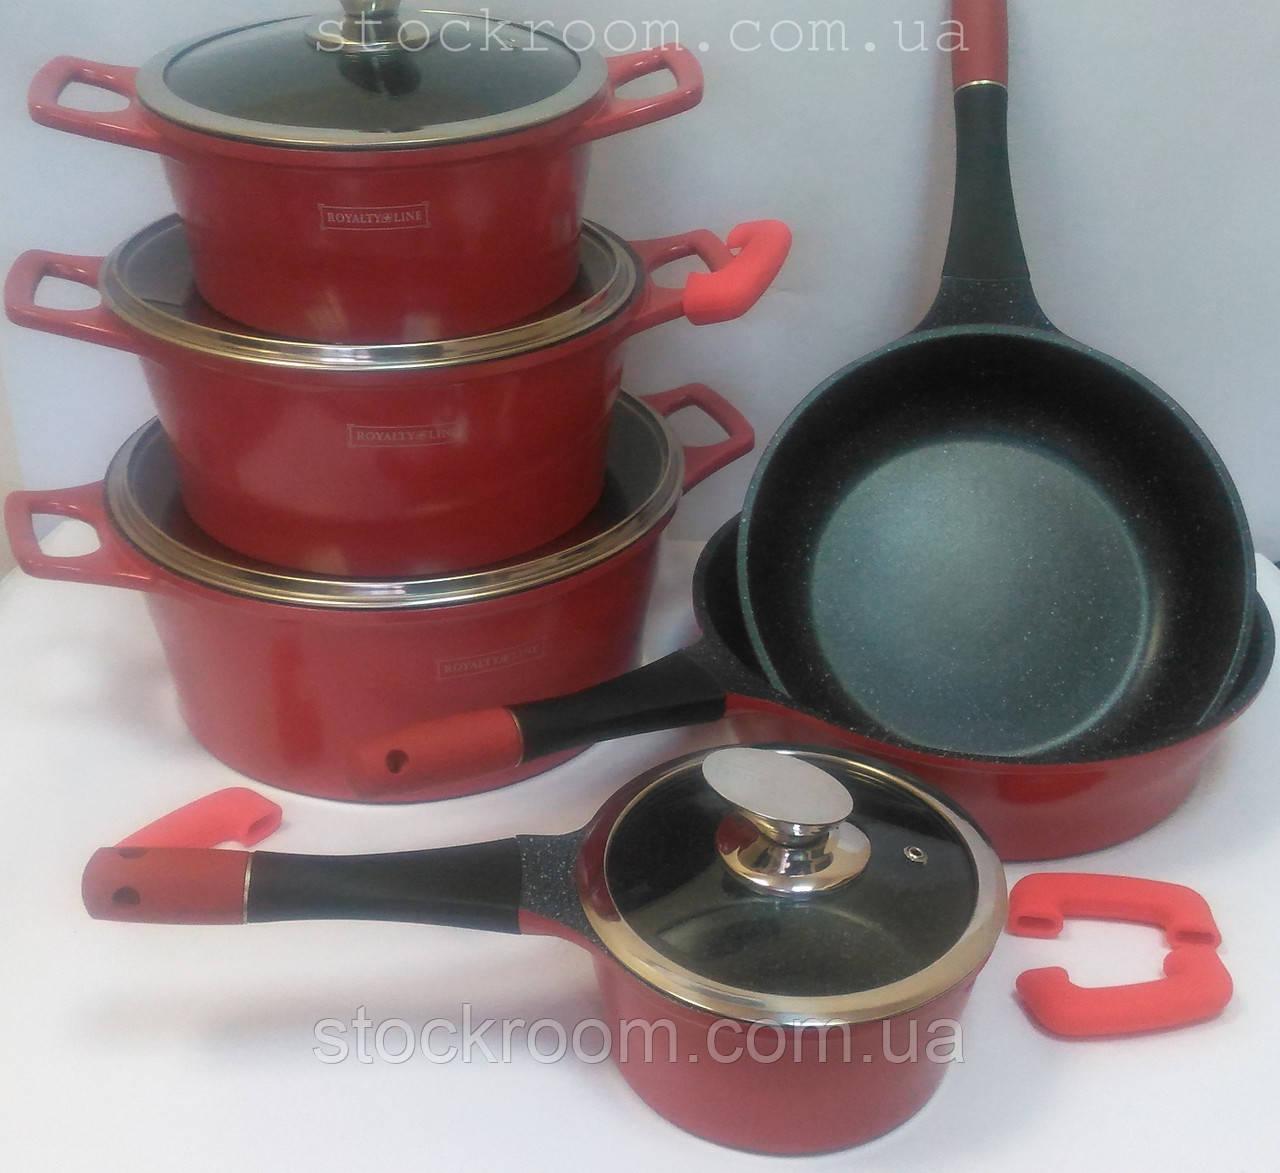 Набор посуды Royalty Line ES 1014 M с мраморным покрытием